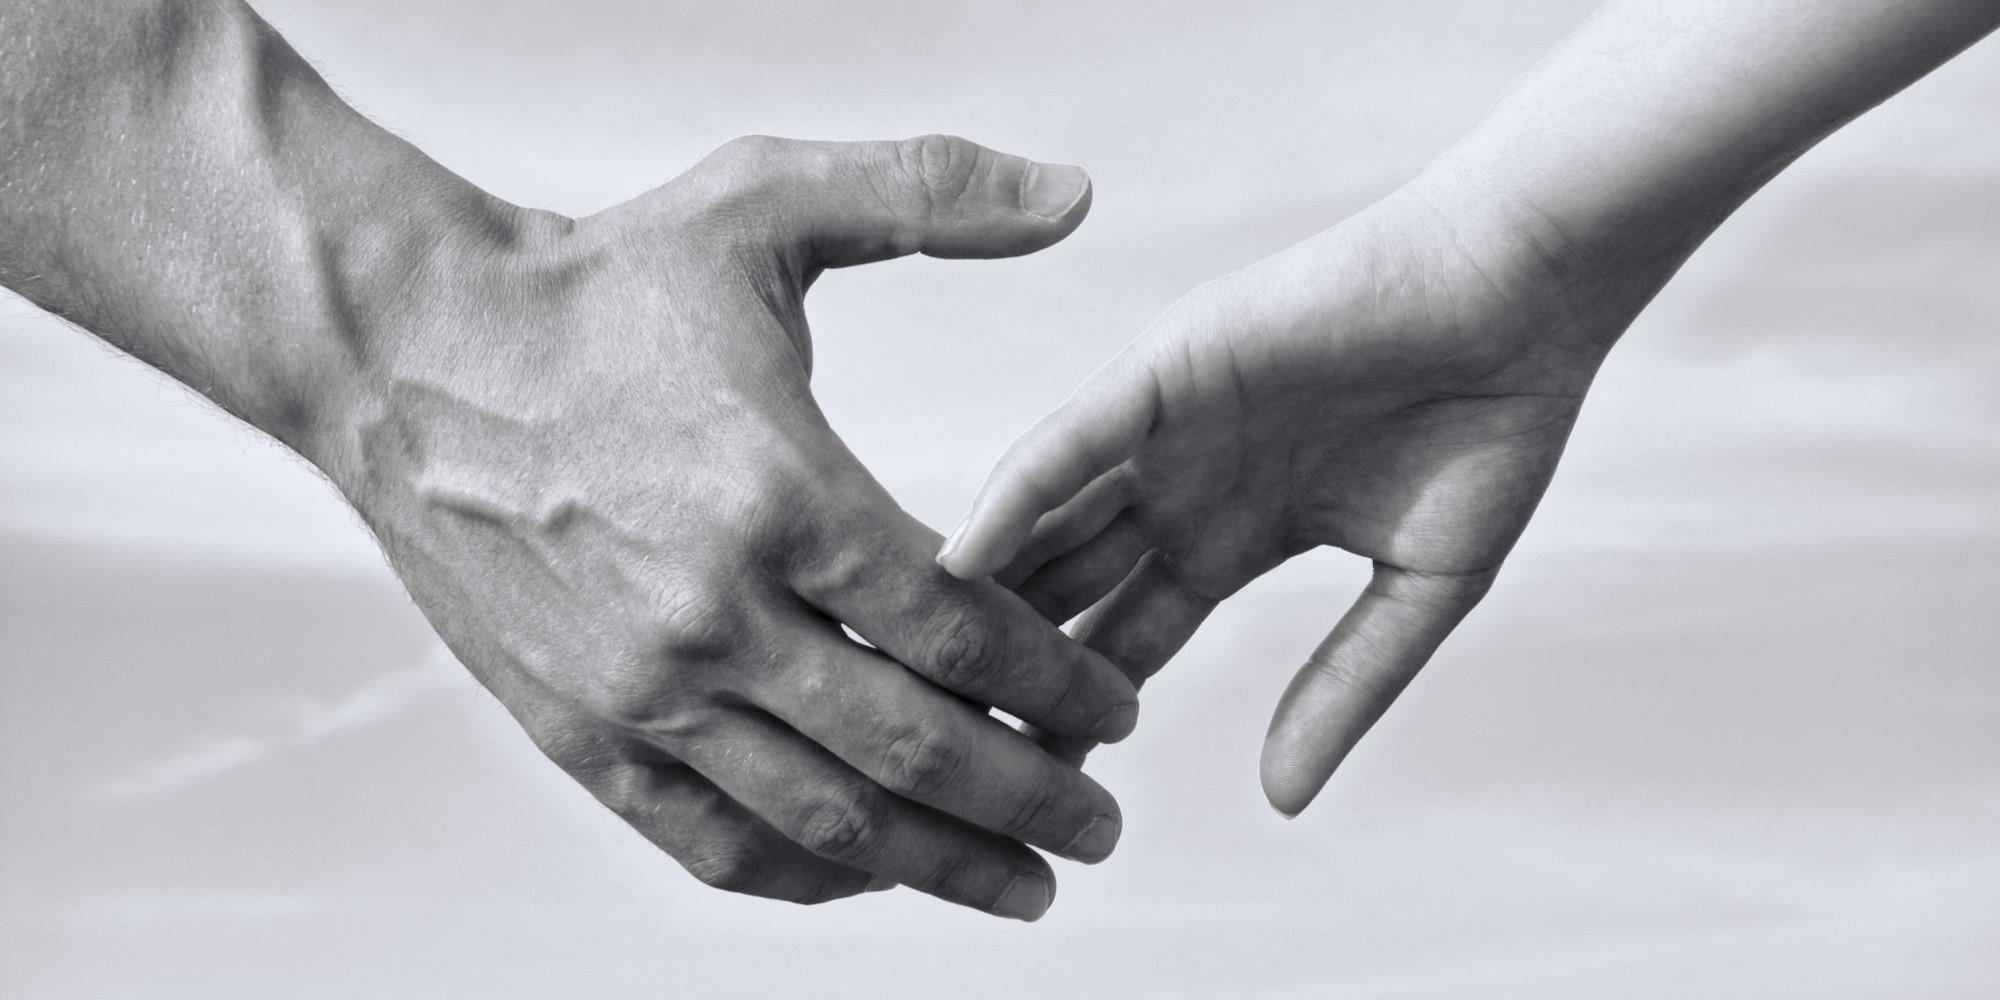 https://i2.wp.com/i.huffpost.com/gen/2611958/images/o-HOLDING-HANDS-facebook.jpg